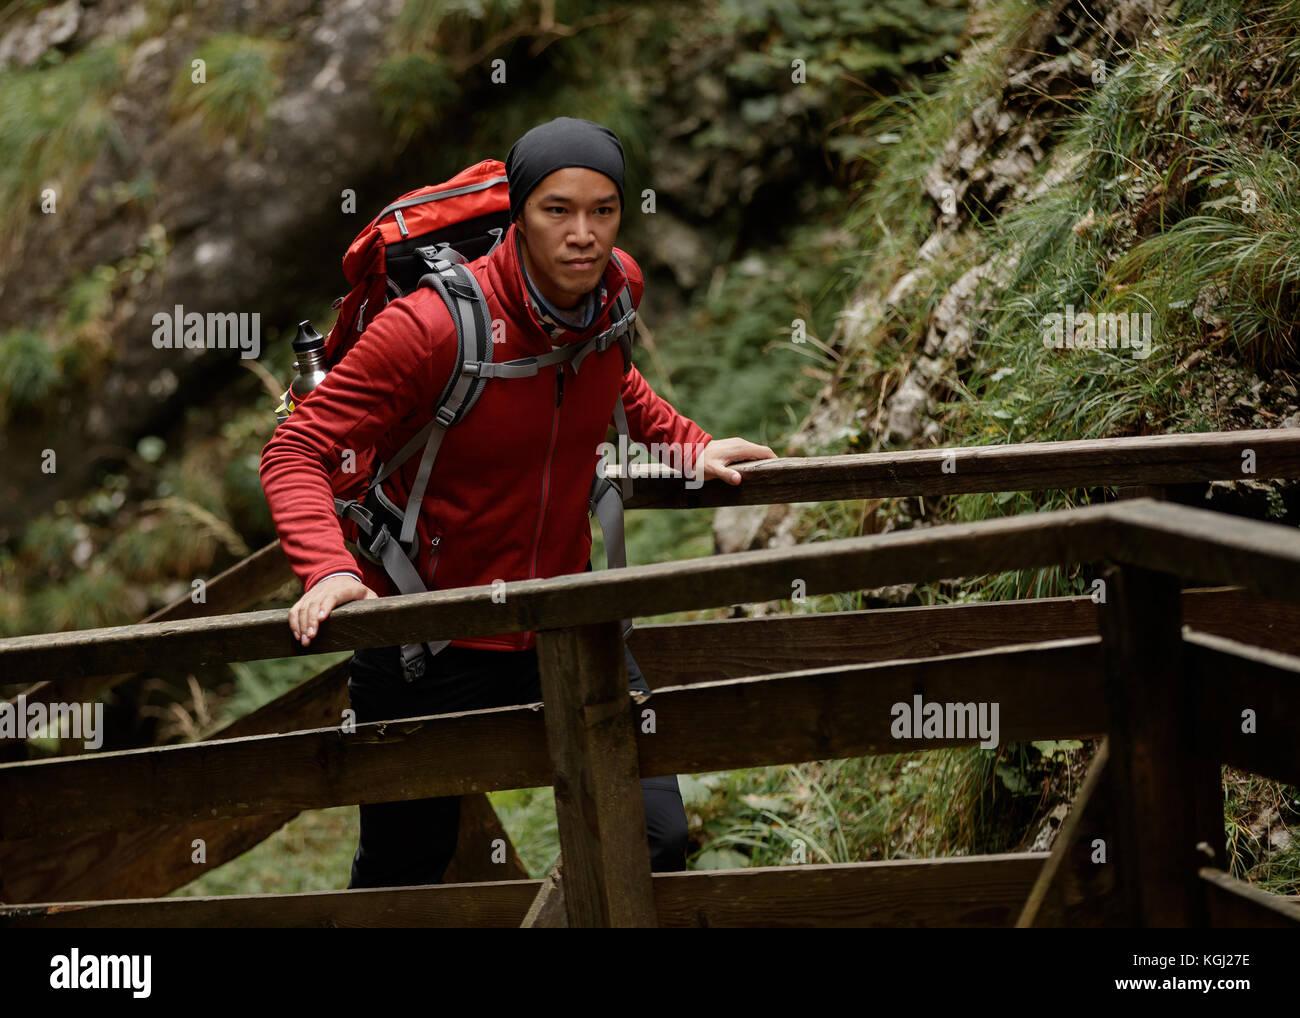 A man hiking along a trail - Stock Image